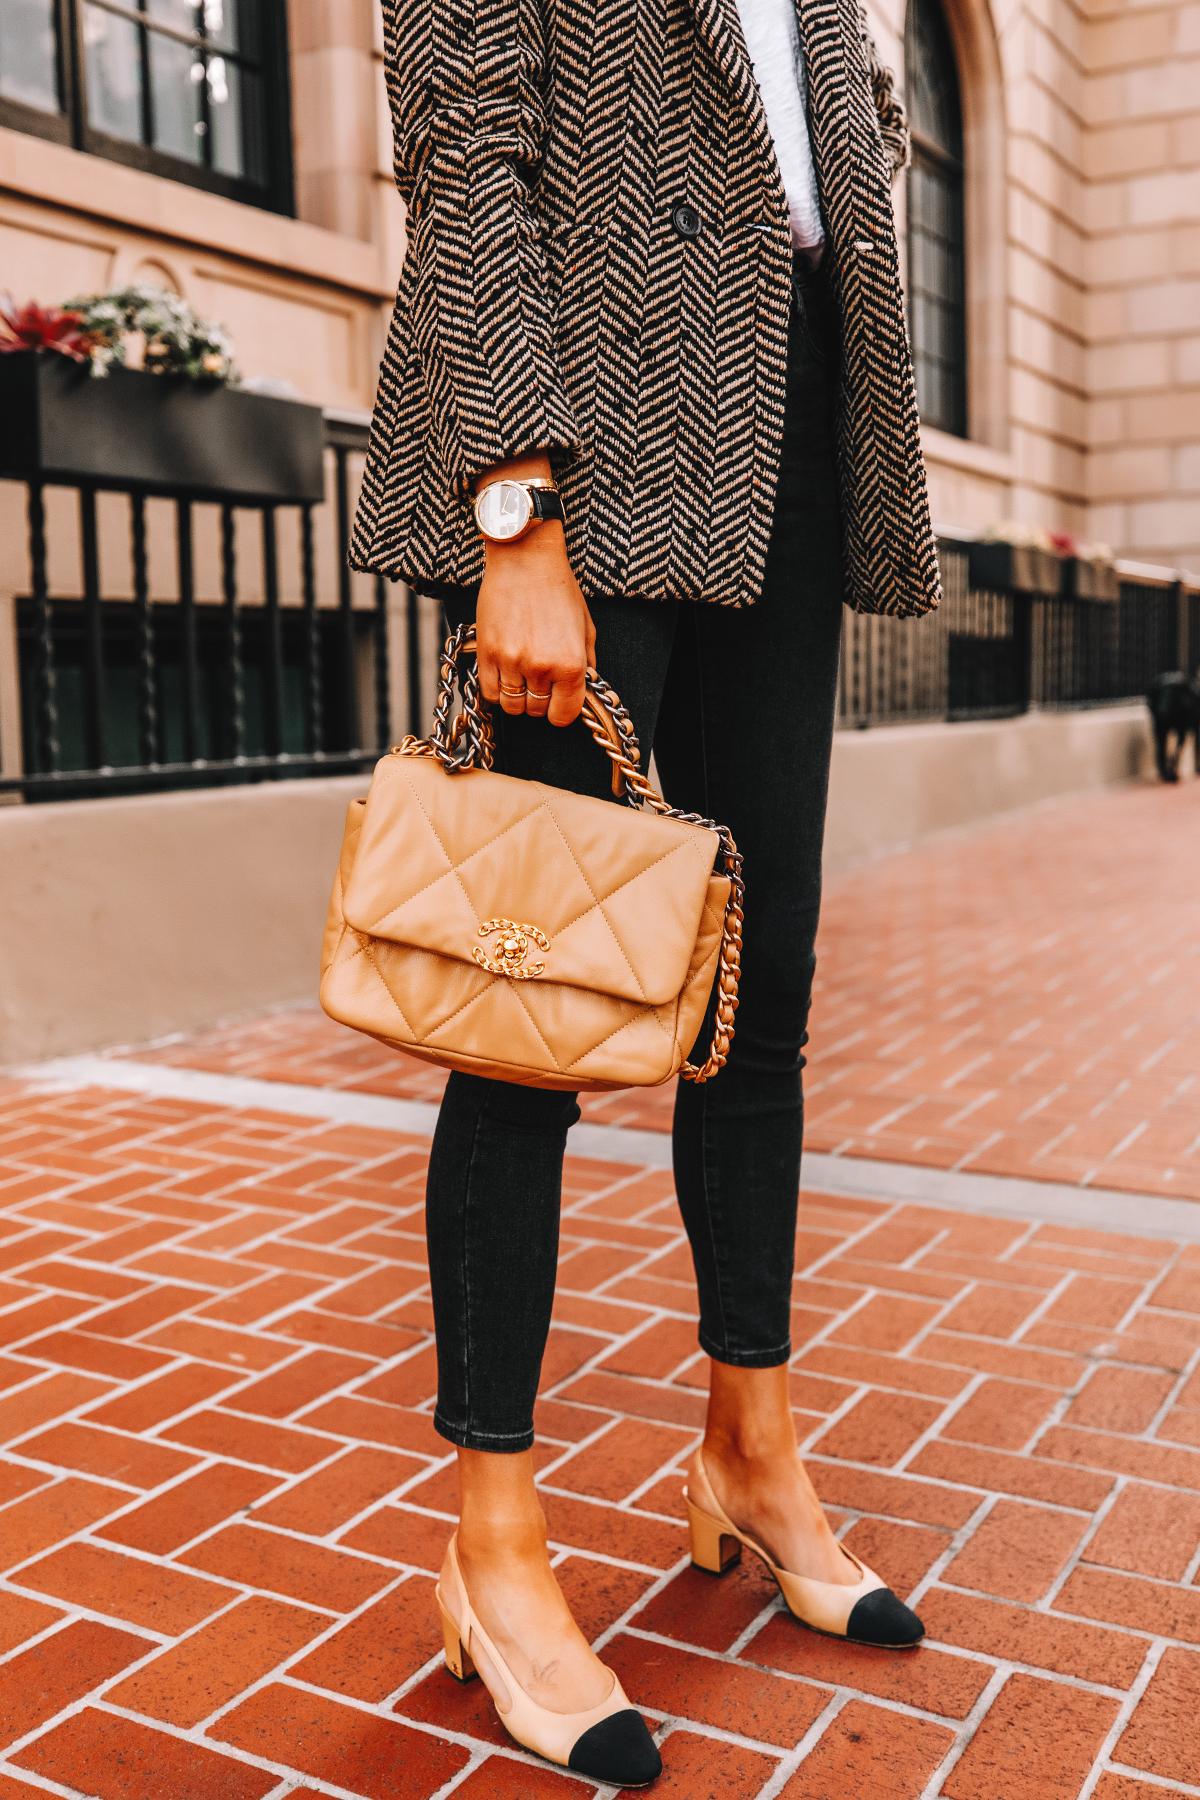 Fashion Jackson Wearing Anine Bing Herringbone Blazer Black Skinny Jeans Chanel Slingbacks Chanel 19 Beige Handbag Garmin Vivomove Smartwatch